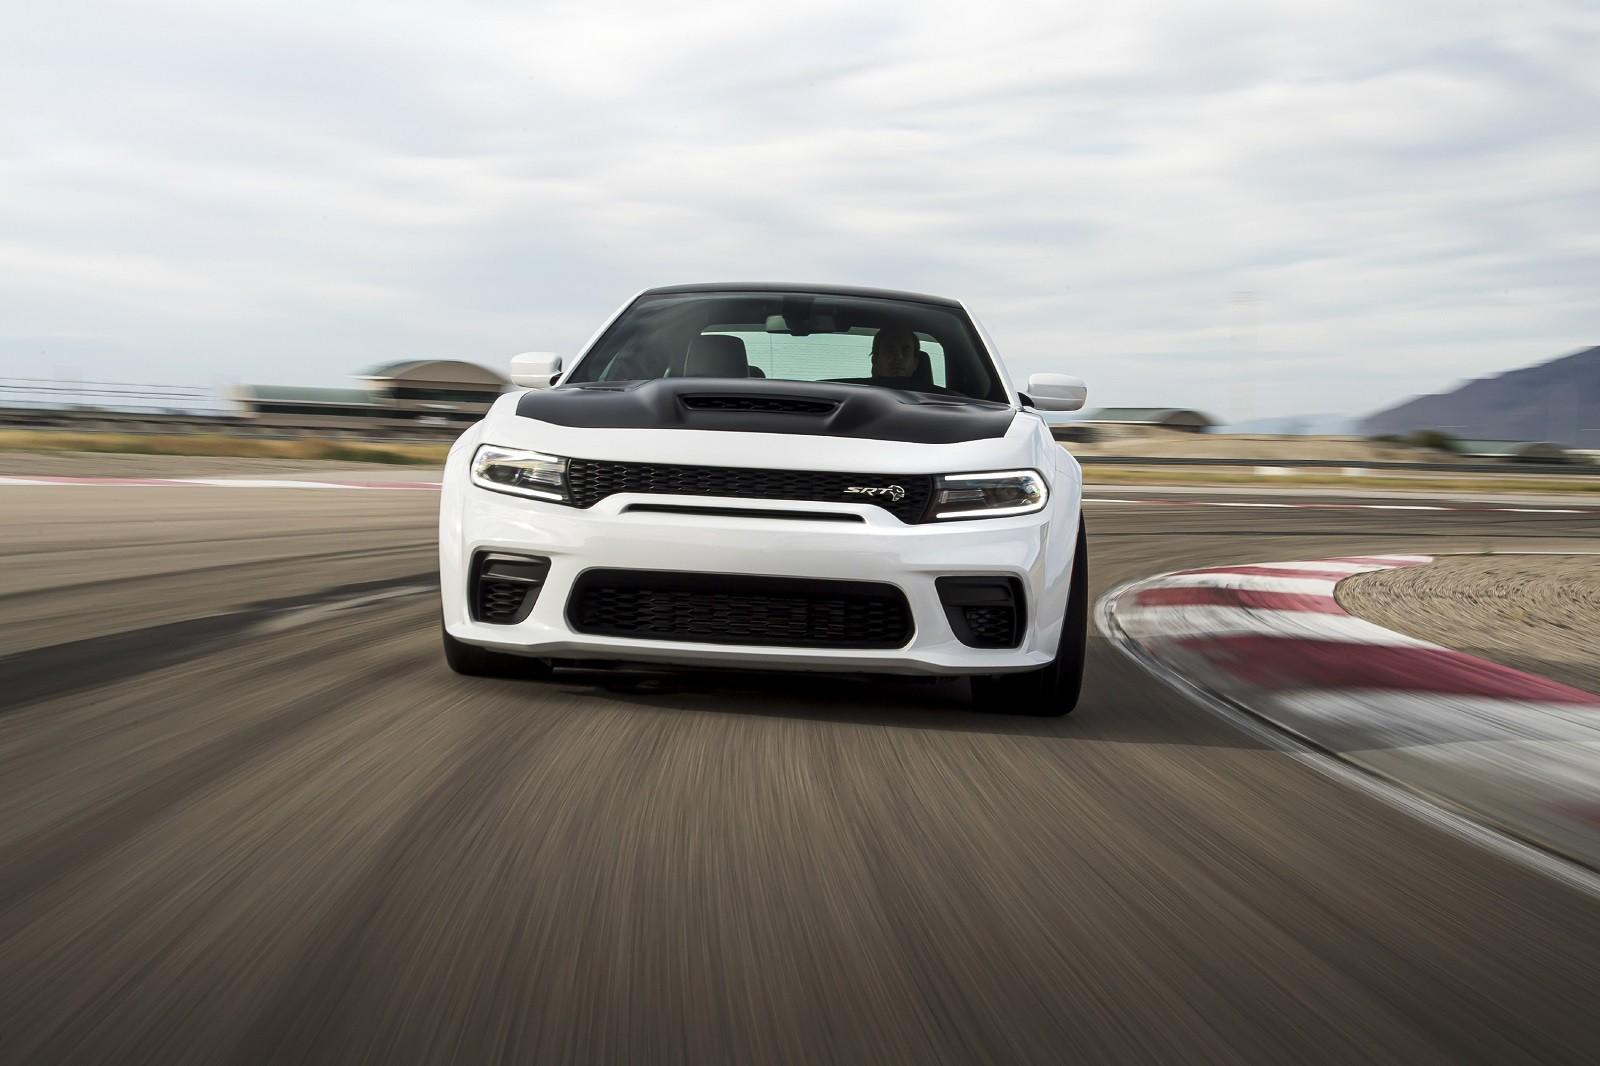 Foto de Dodge Charger SRT Hellcat Redeye 2021 (12/49)